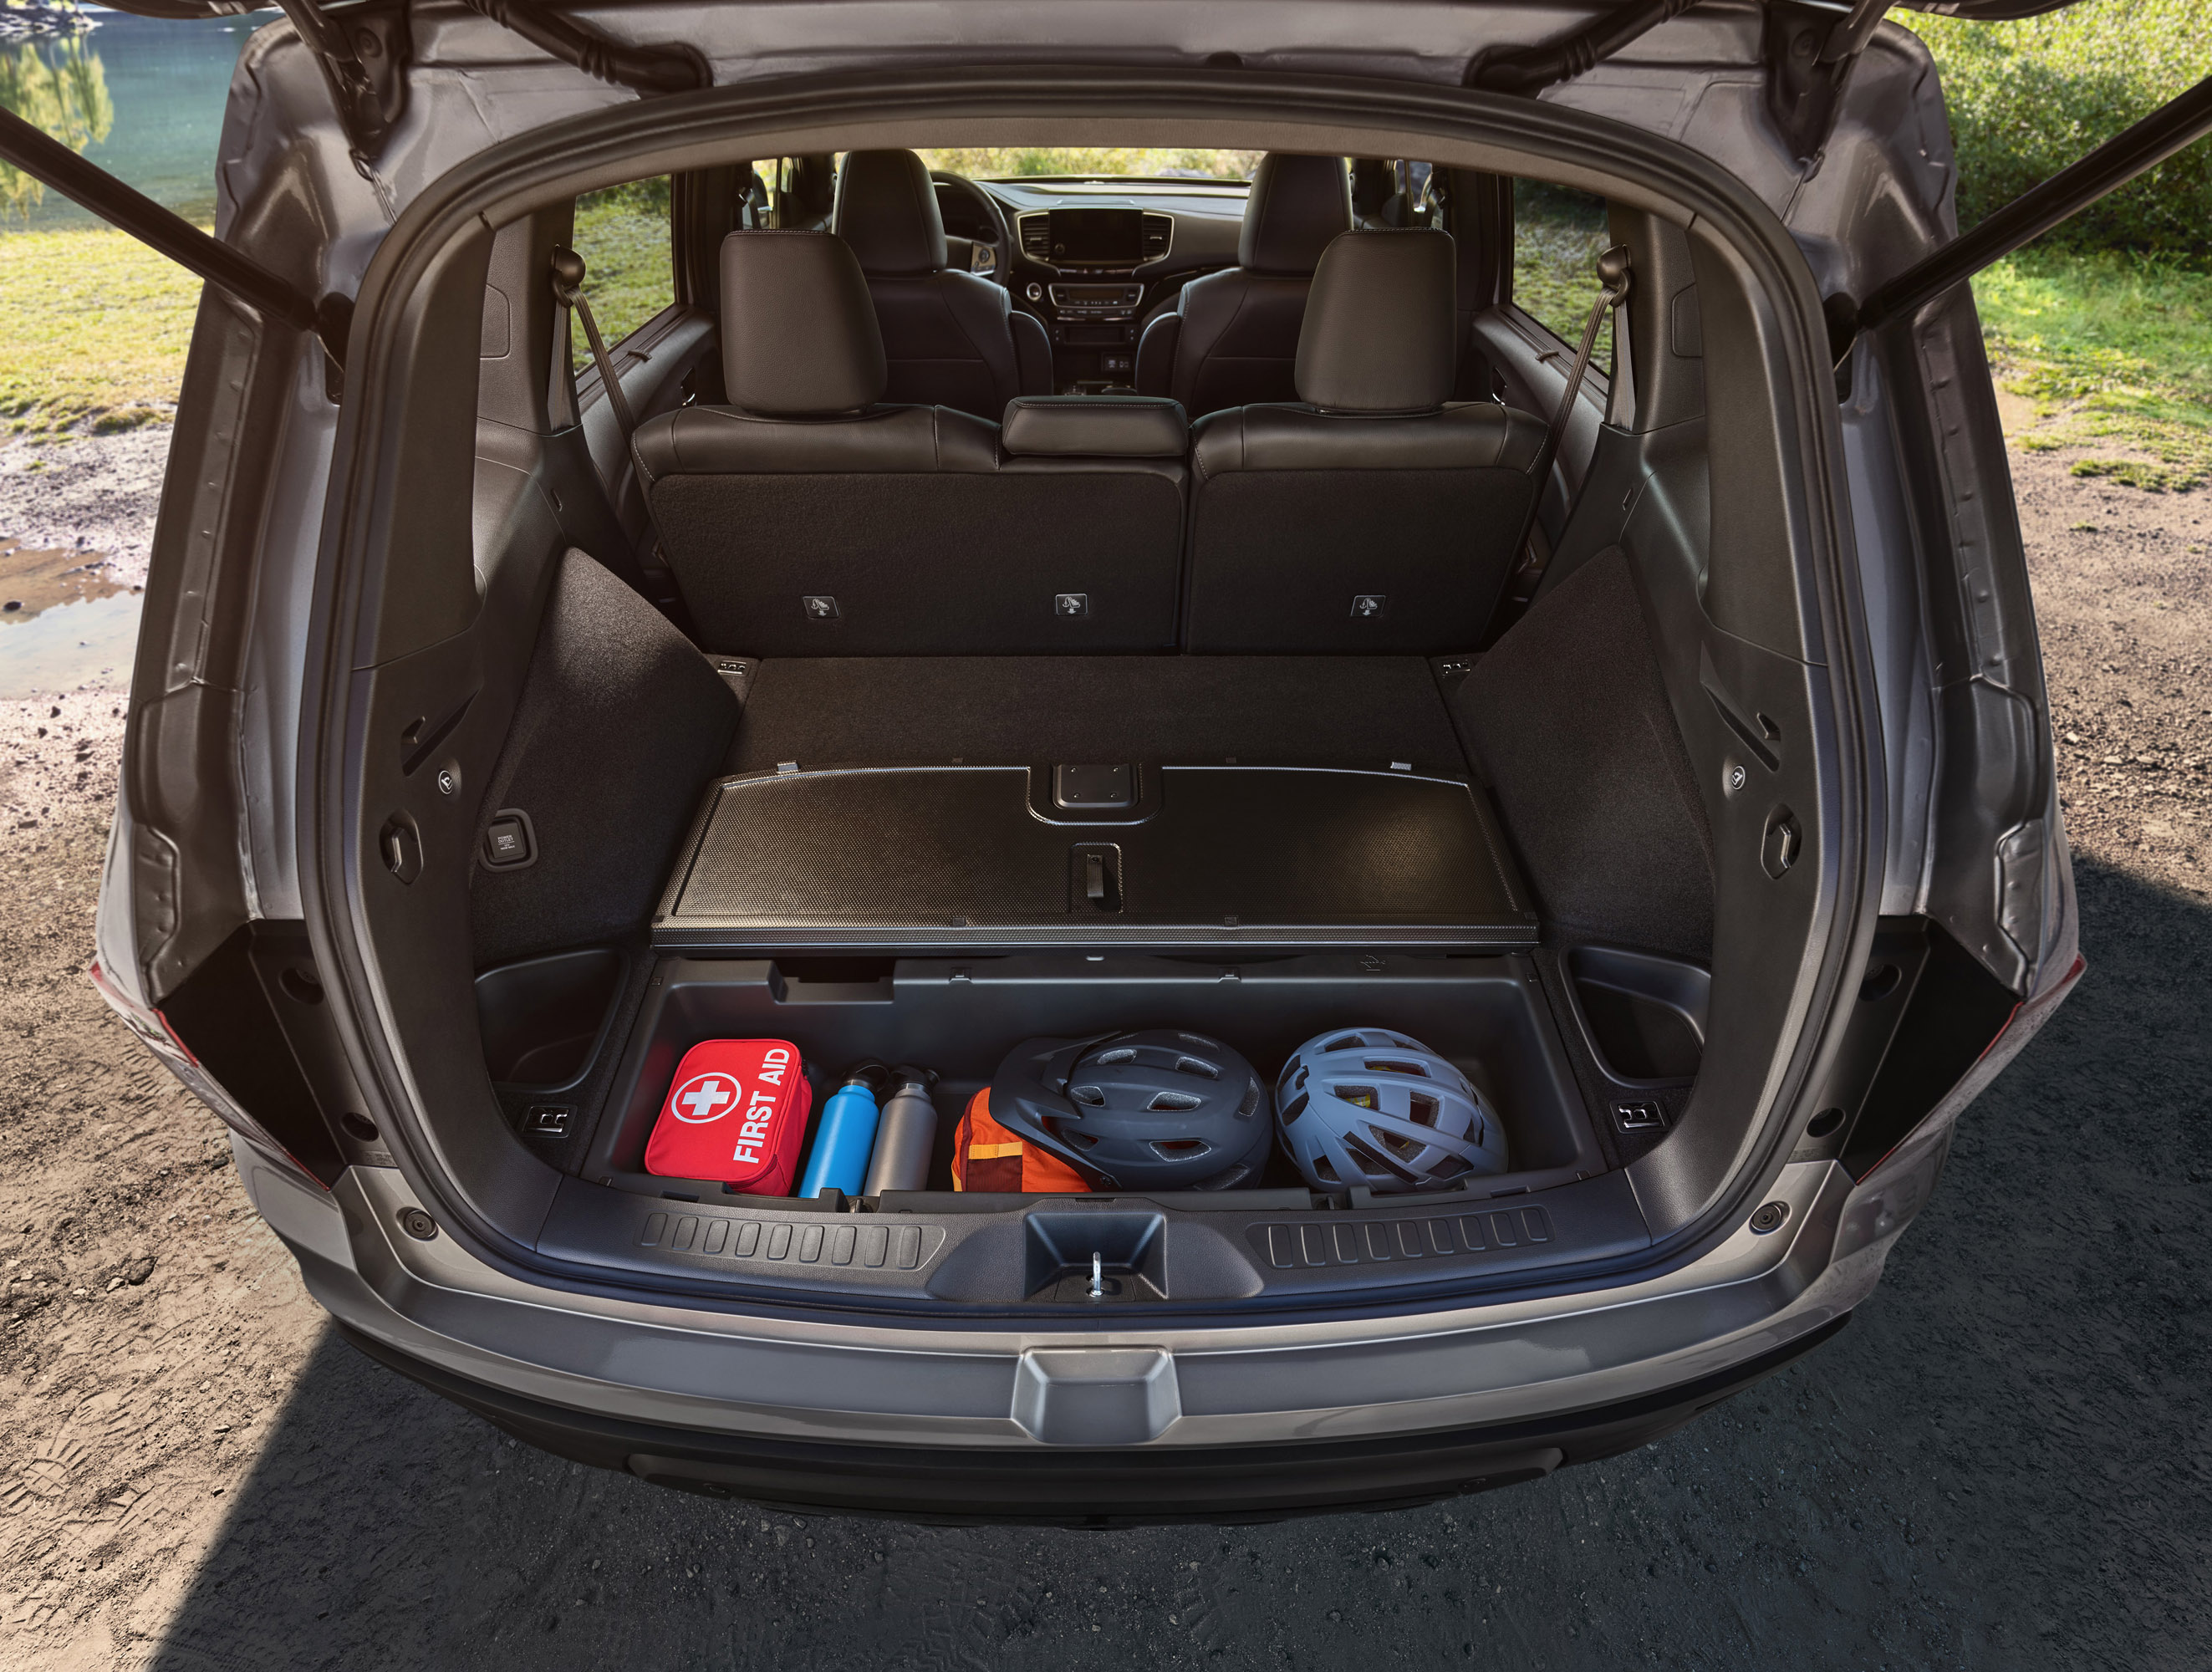 Honda reveals new Passport SUV